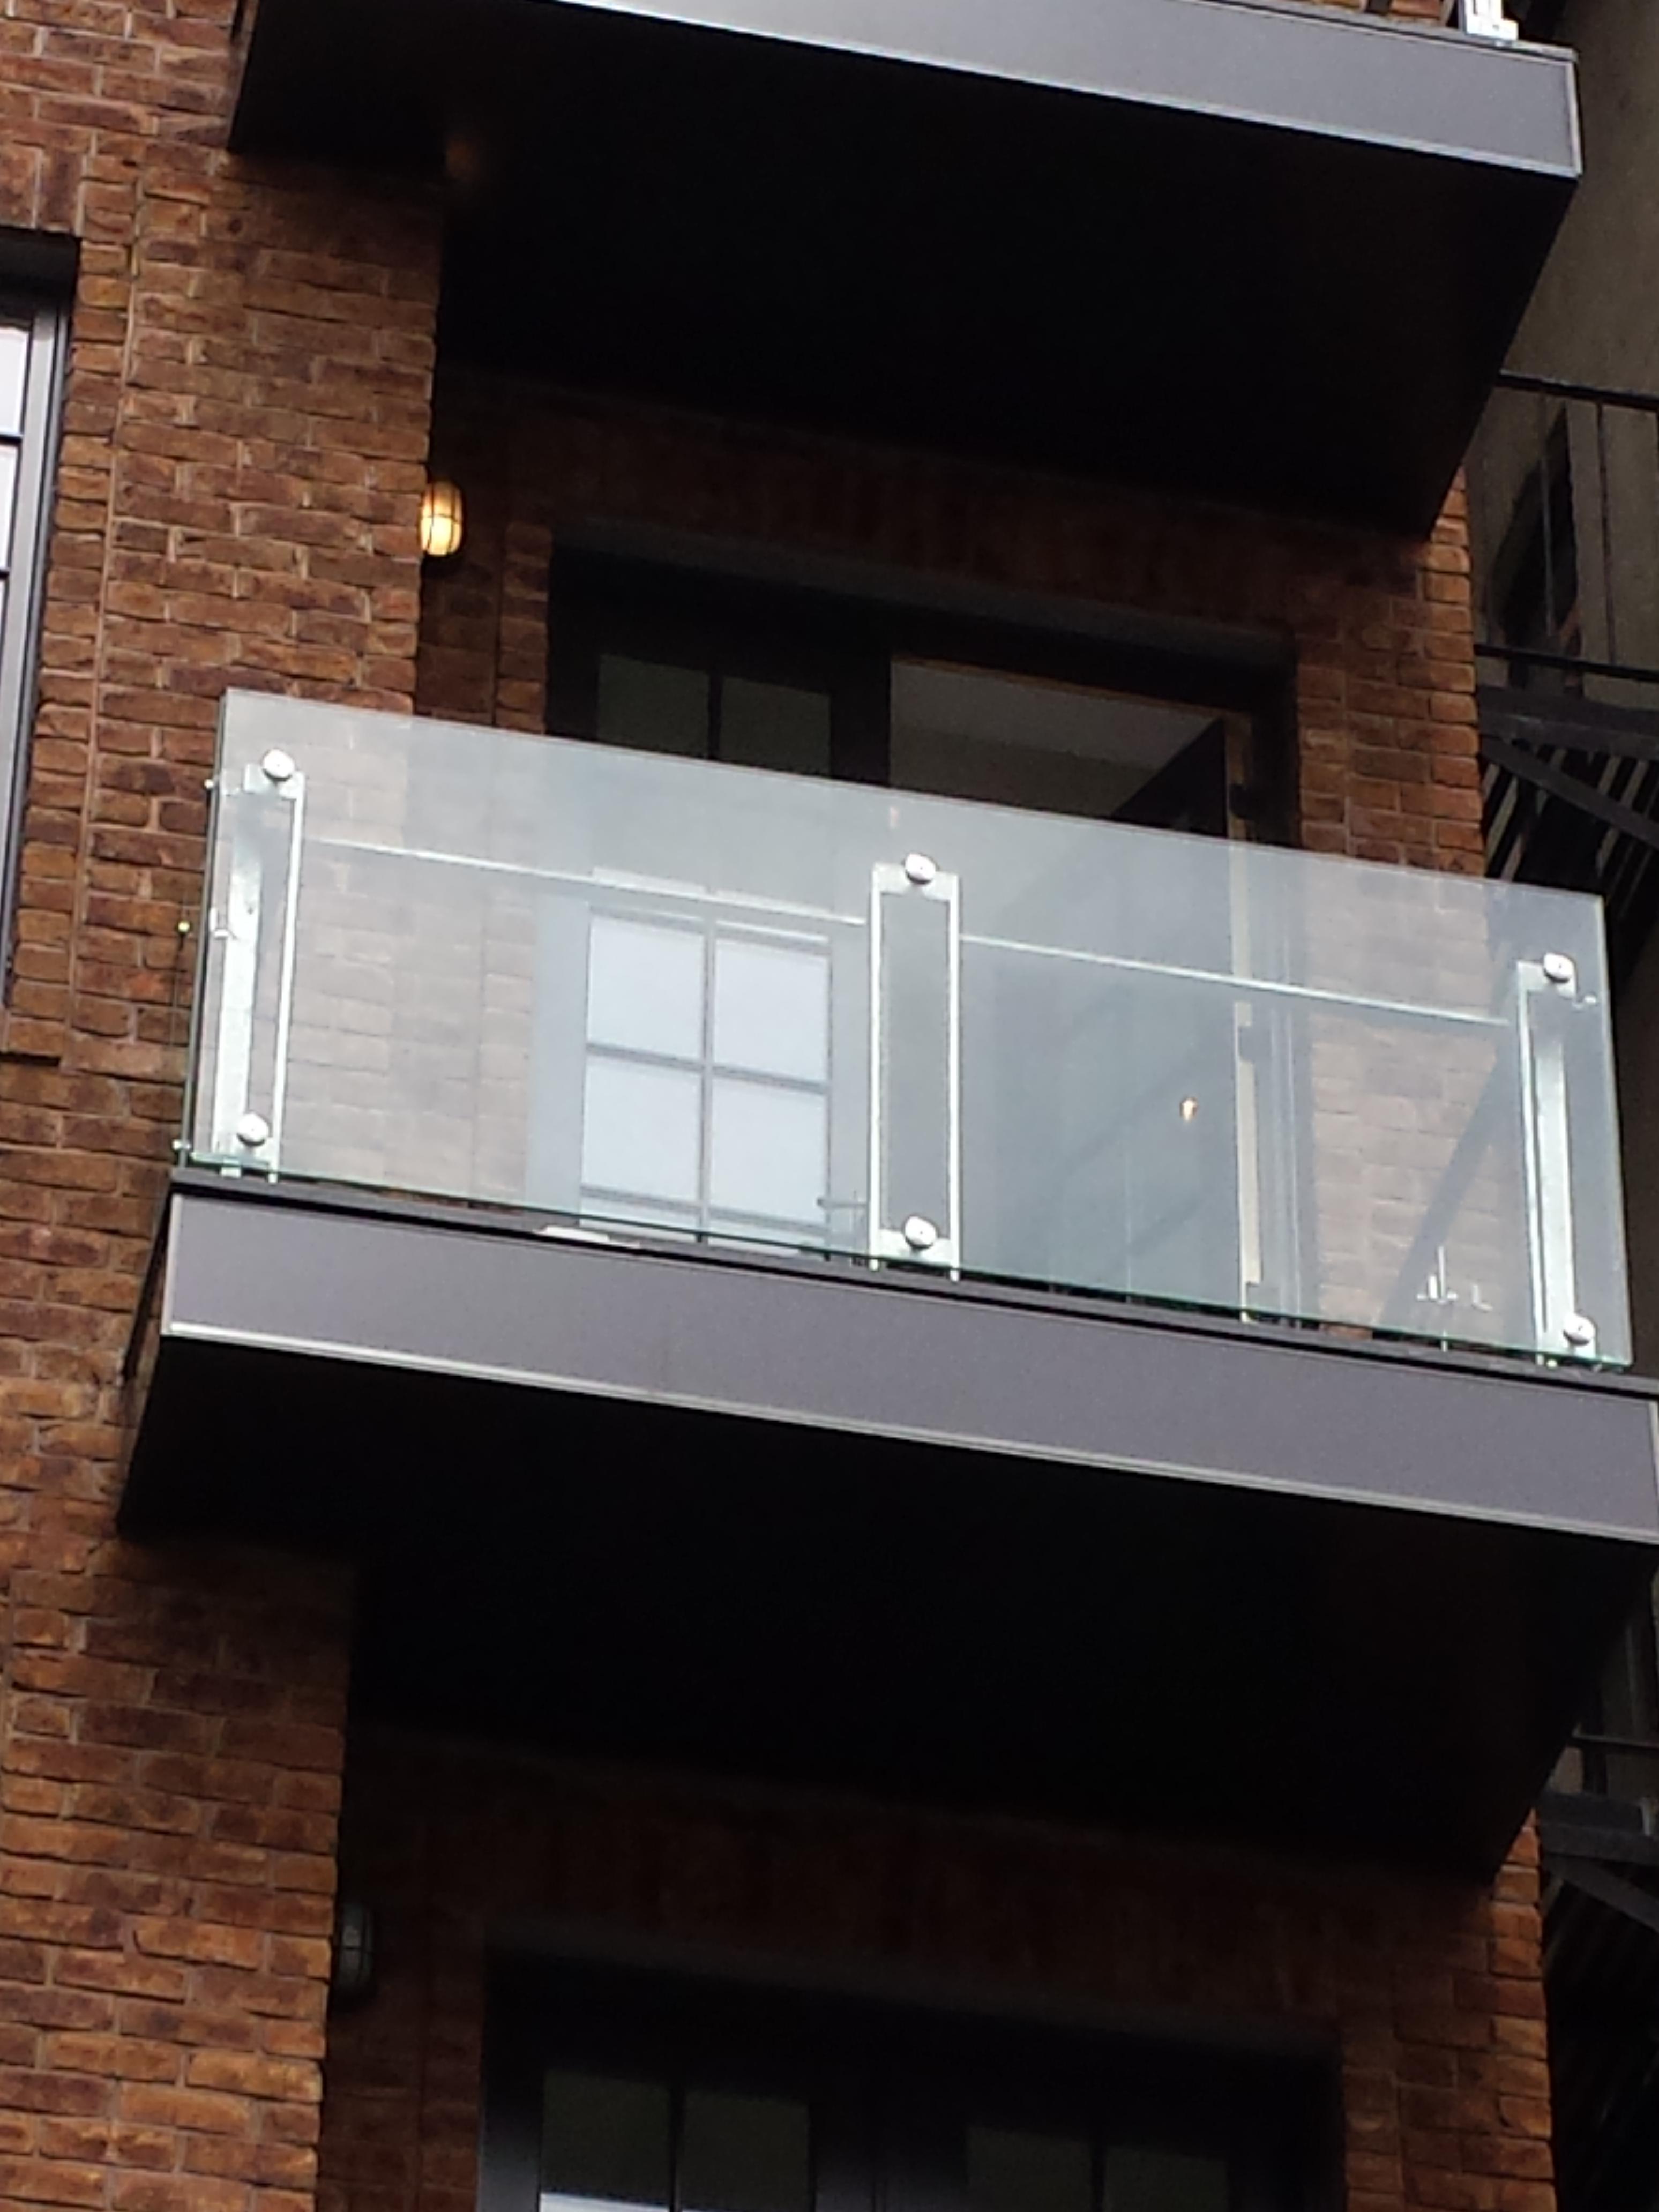 Deluxe Custom Windows And Doors New Jersey Amp New York